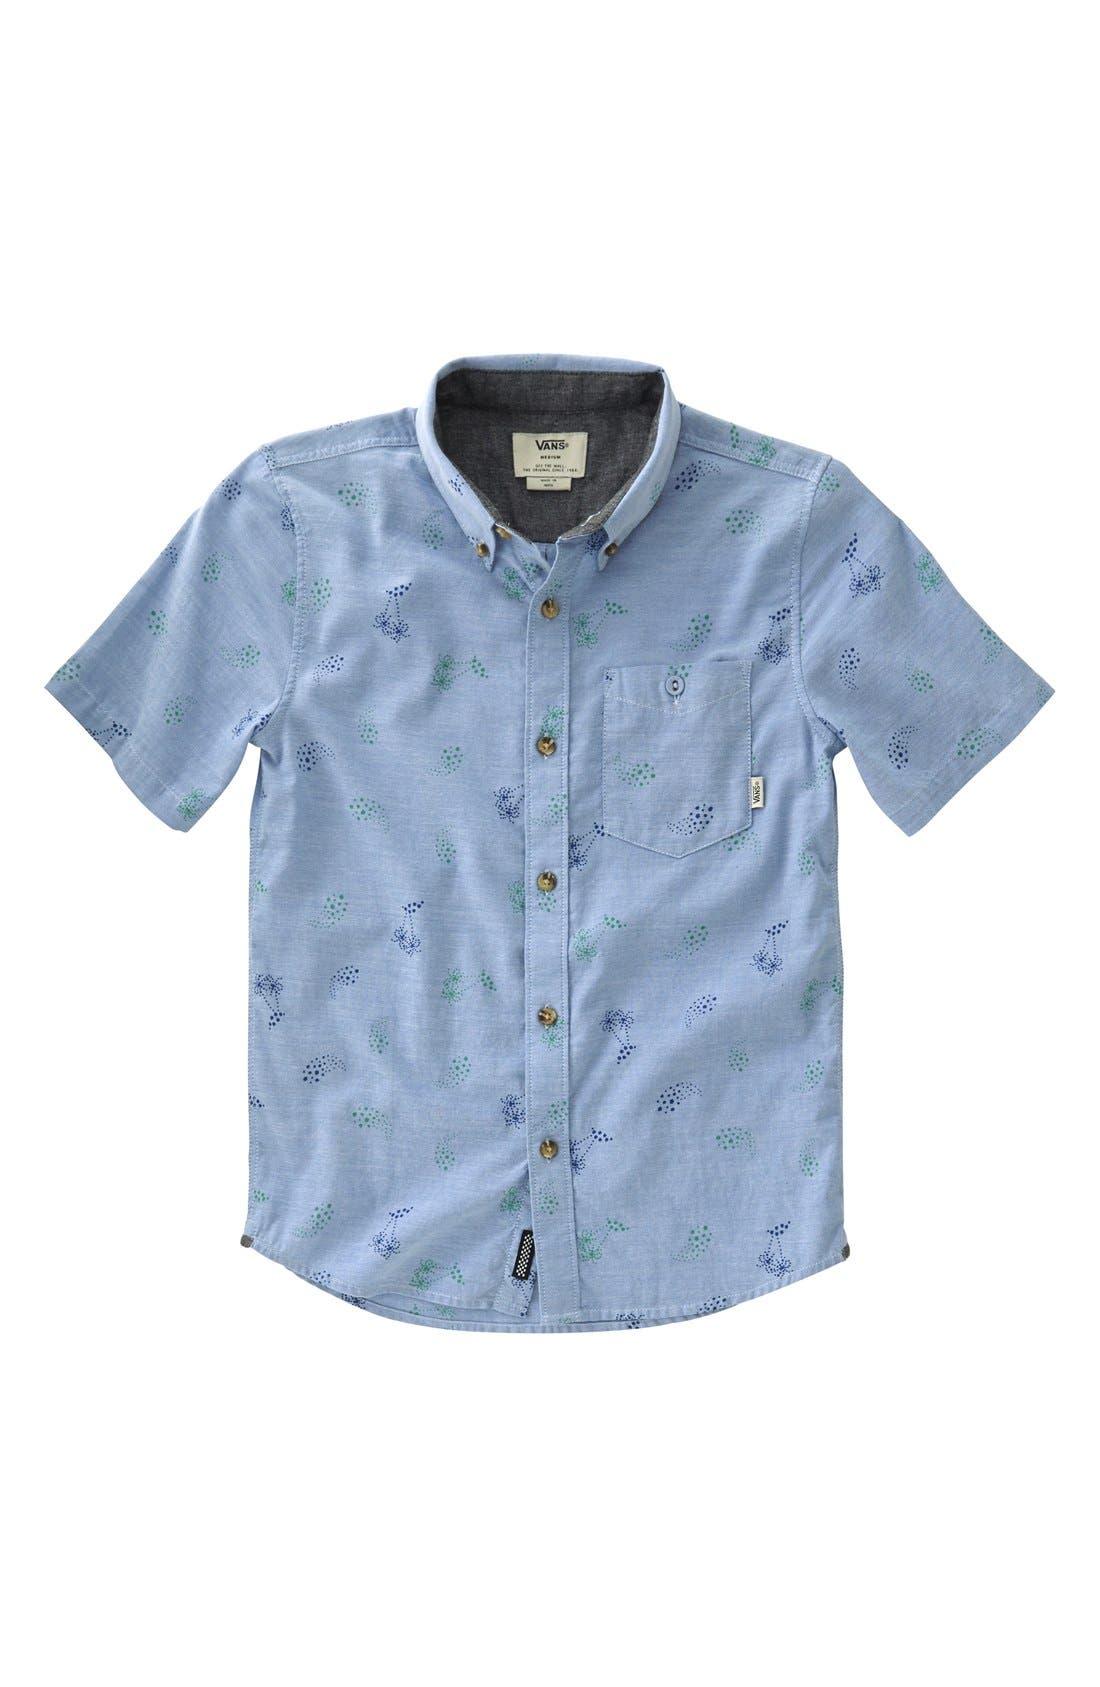 Alternate Image 1 Selected - Vans 'Baines' Print Oxford Woven Shirt (Big Boys)